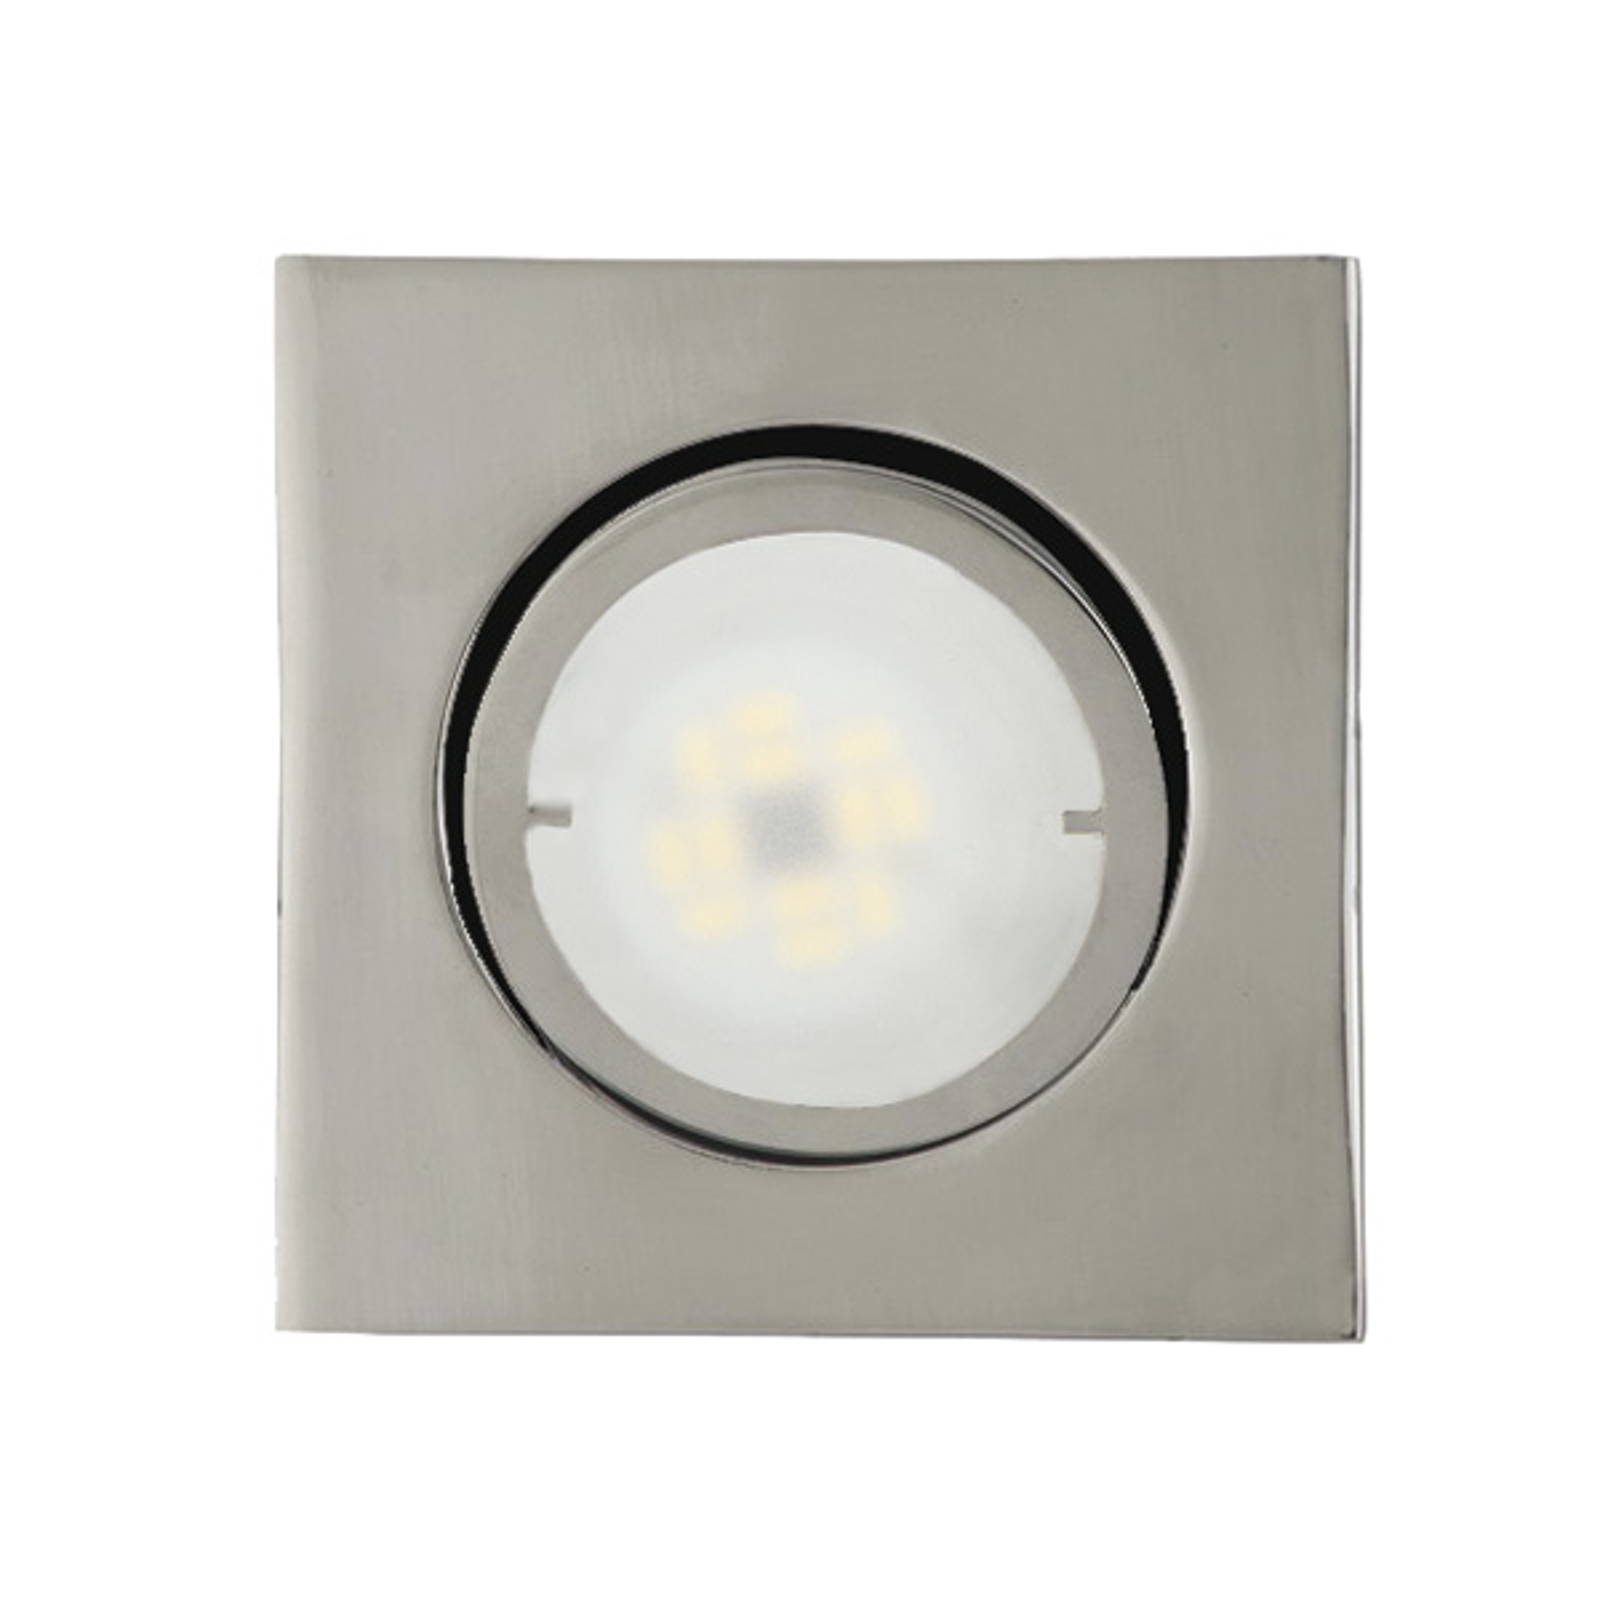 Joanie kantet LED-indbygningslampe, krom